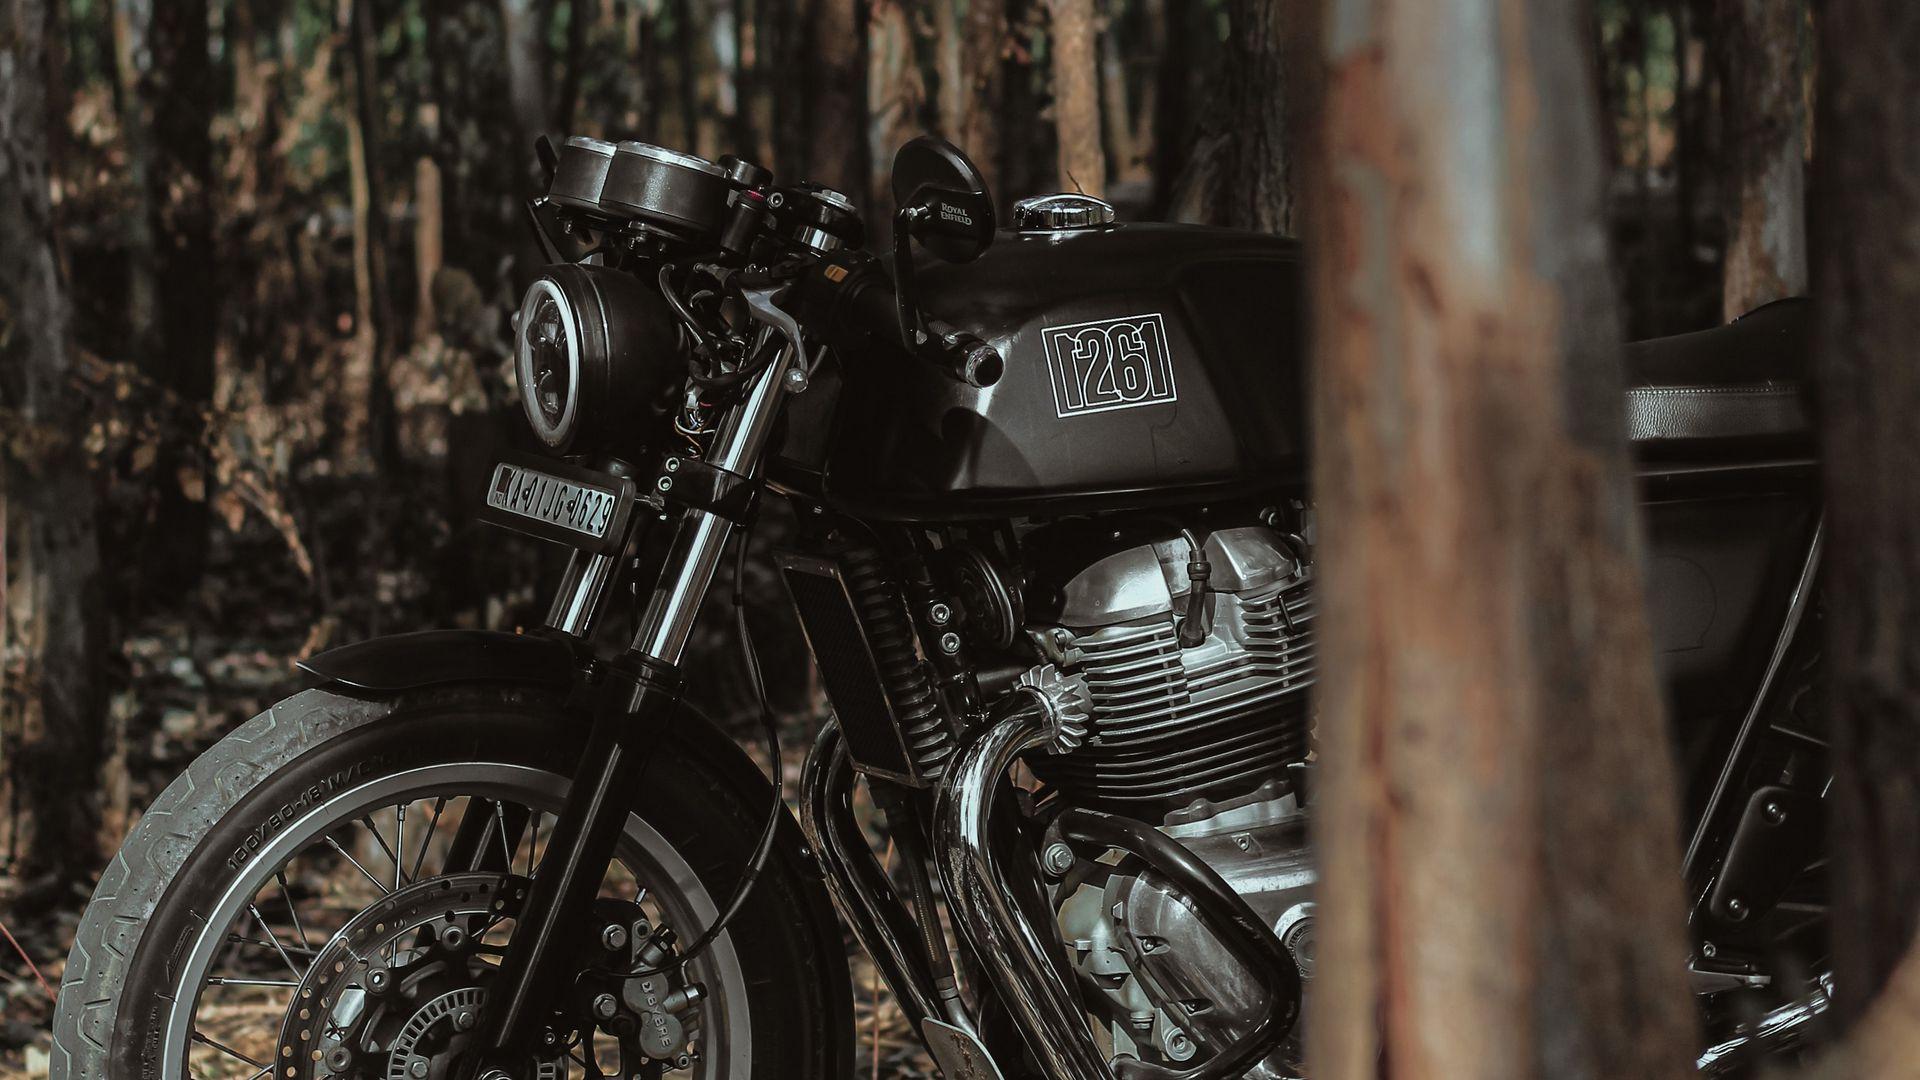 1920x1080 Wallpaper royal enfield, motorcycle, bike, black, forest